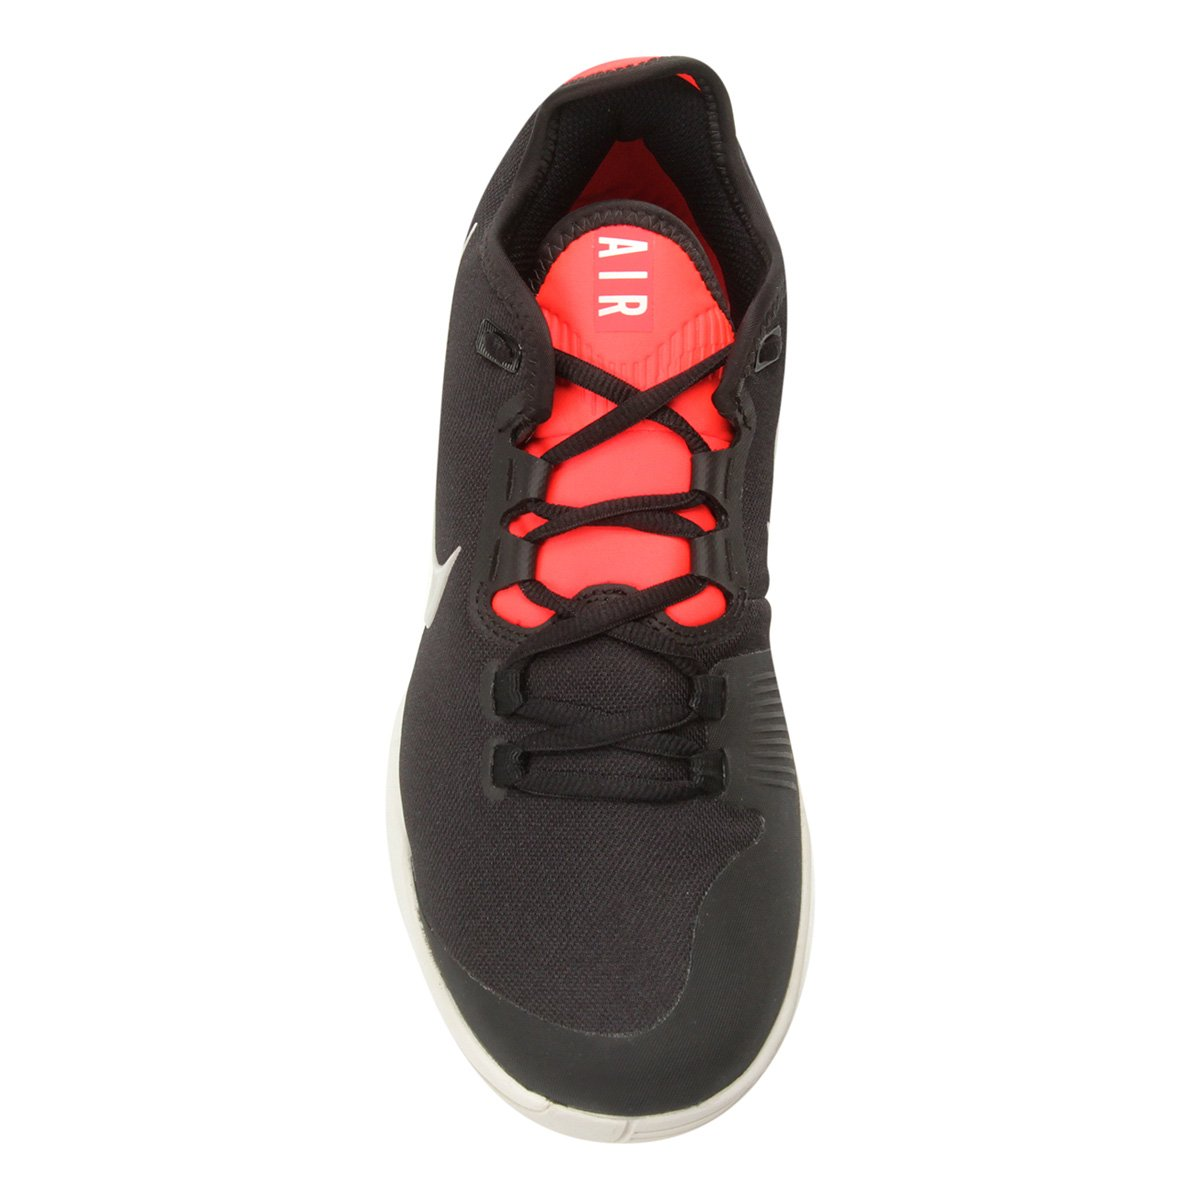 07f6b1912f2 Tênis Nike Air Max Wildcard HC Masculino - Tam  44 - Shopping TudoAzul